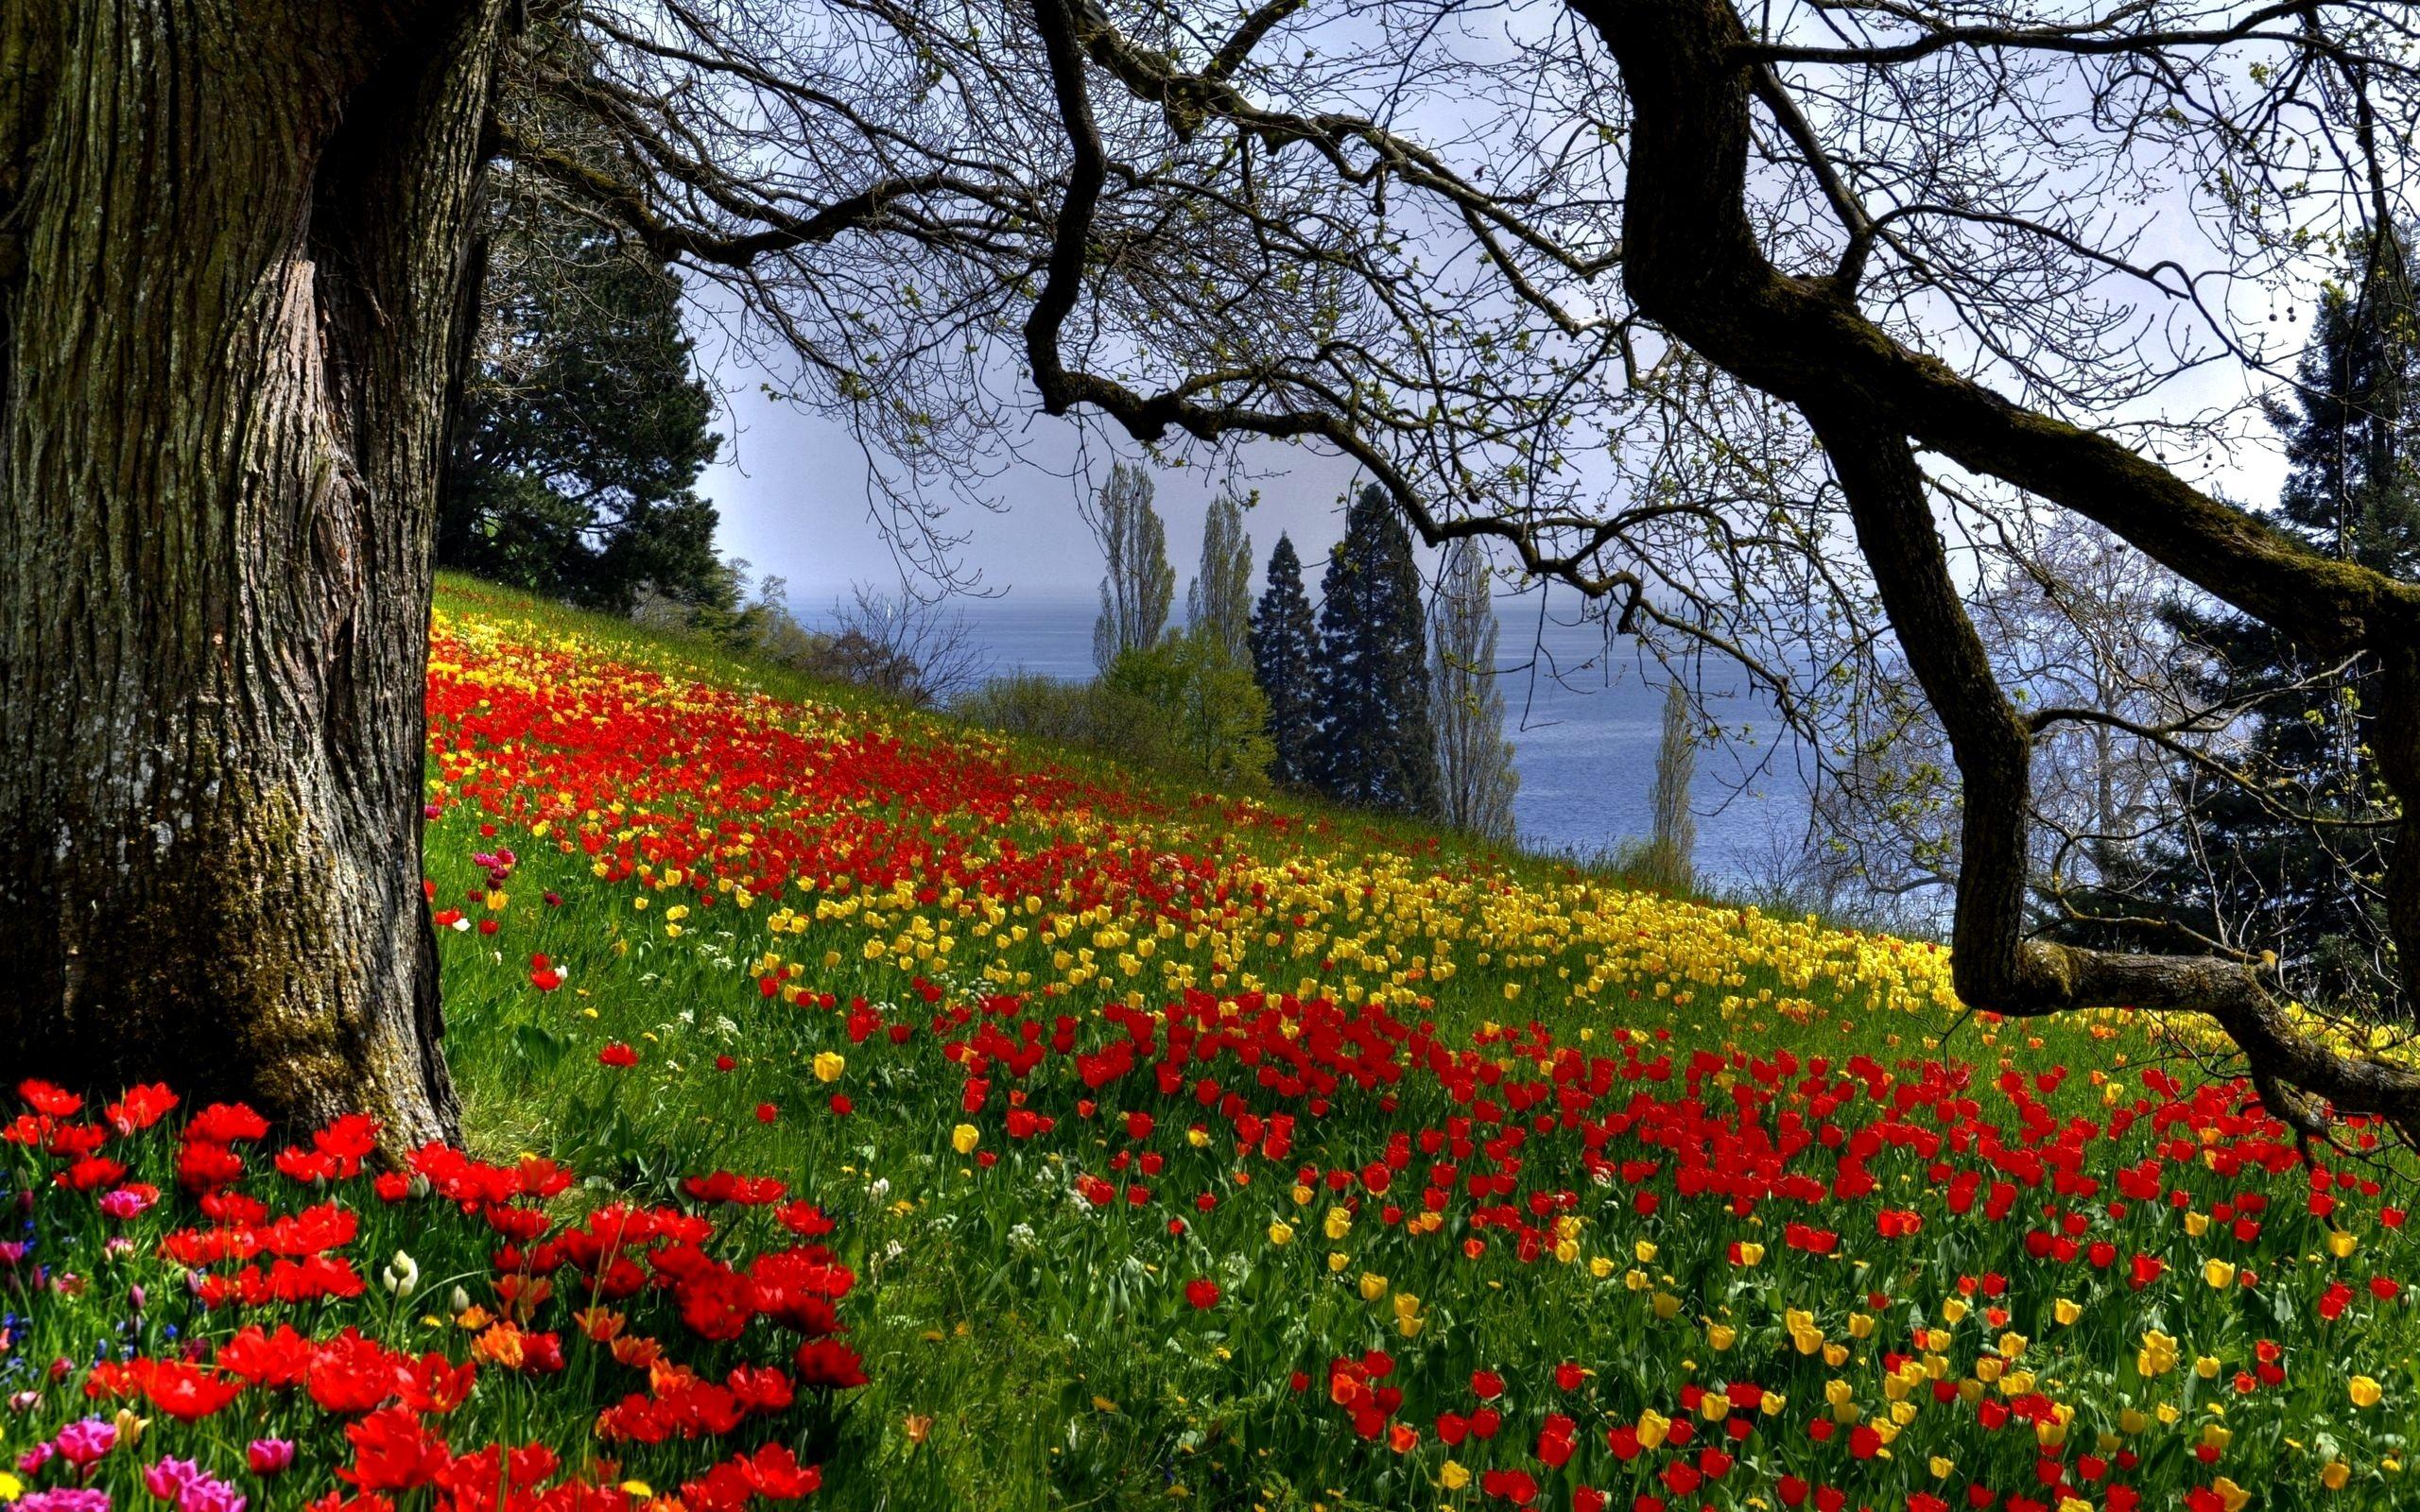 Colourful Flowers In Garden Beautiful Spring Colorful Field Flower Garden Plants Sea Slope Beautiful Forest Forest Flowers Spring Wallpaper